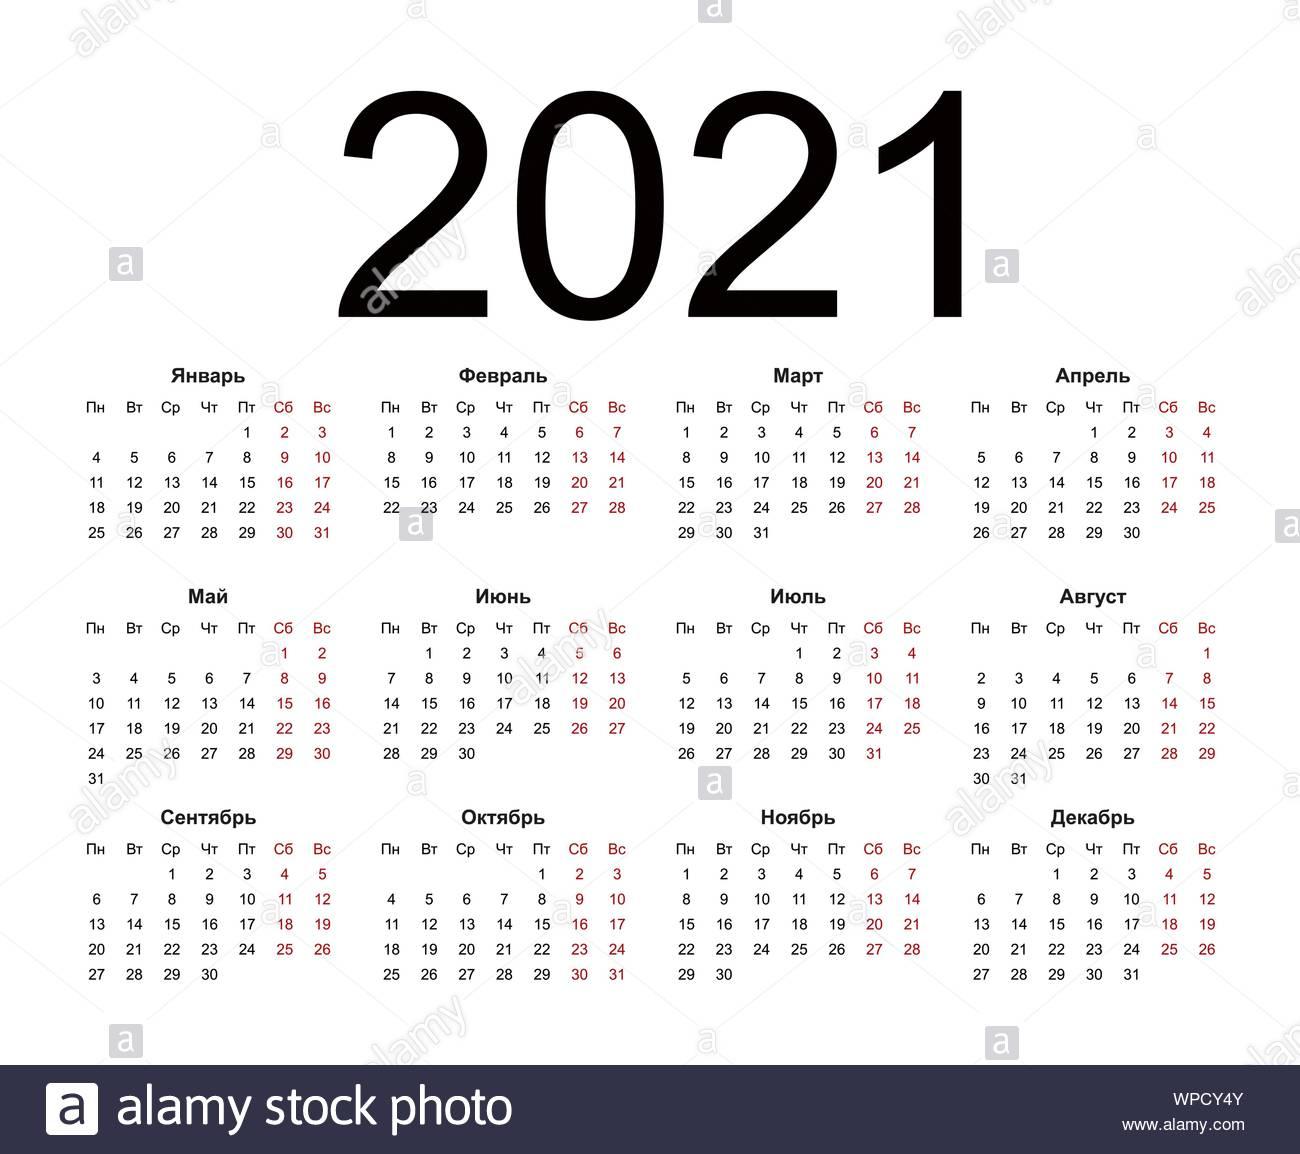 Kalender 2021 Stockfotos & Kalender 2021 Bilder - Alamy